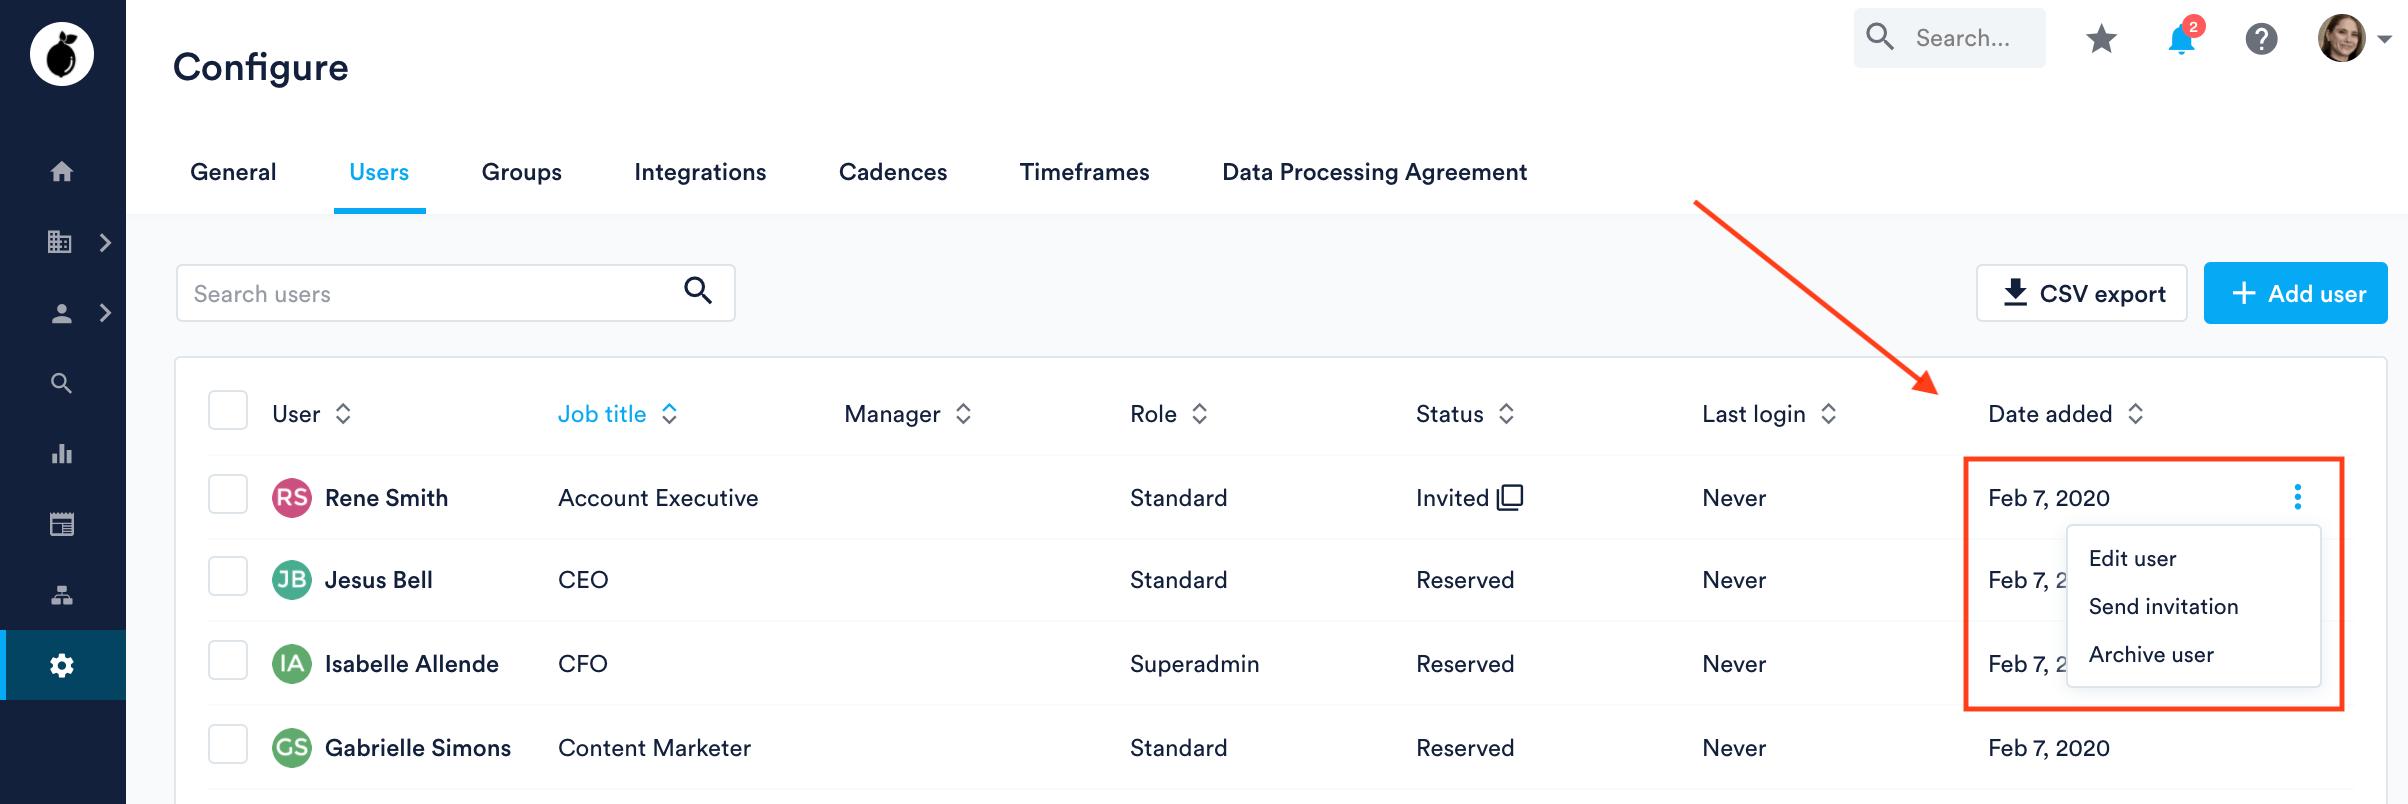 Edit user in Configure Users tab